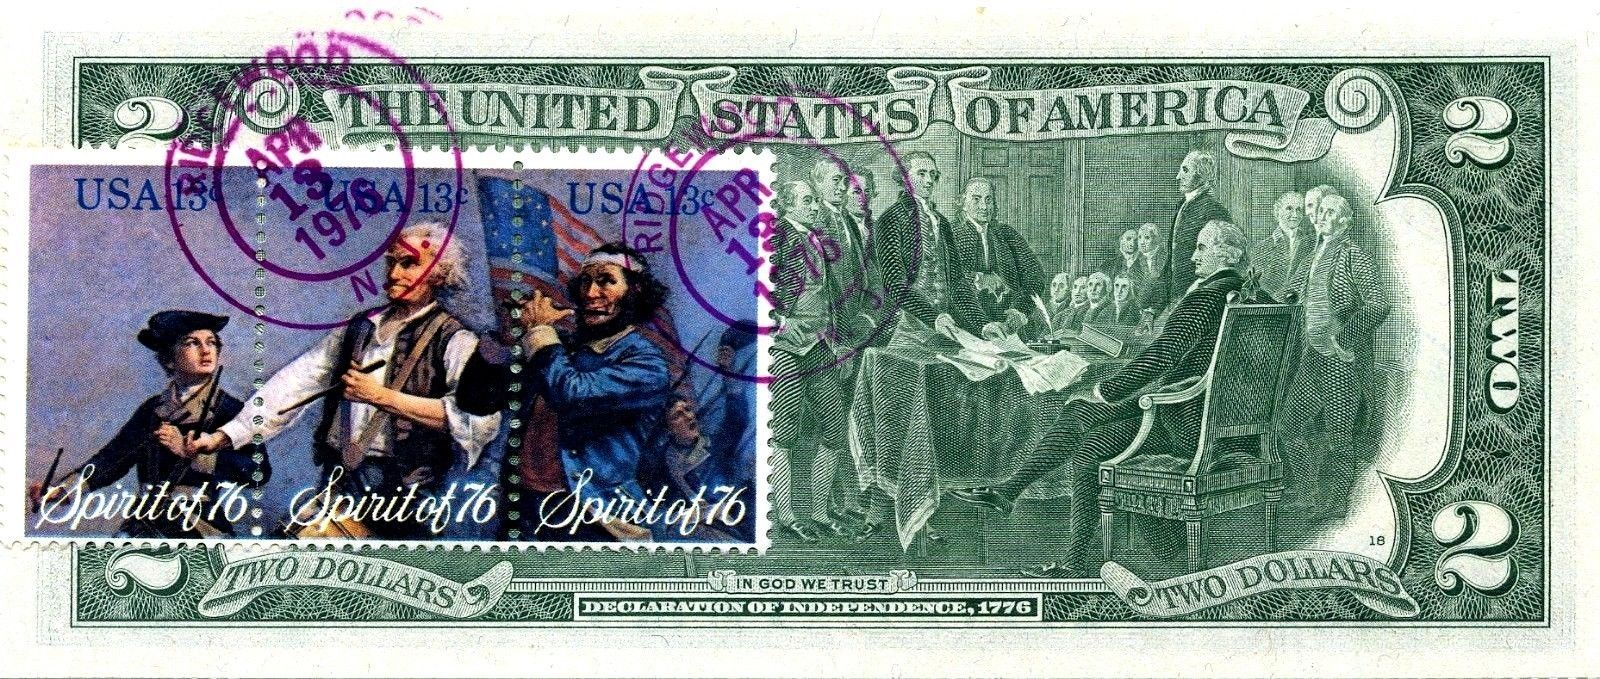 MONEY US $2 DOLLARS 1976 NEW YORK  FIRST DAY STAMP CANCEL & HANUKKAH GEM UNC image 2